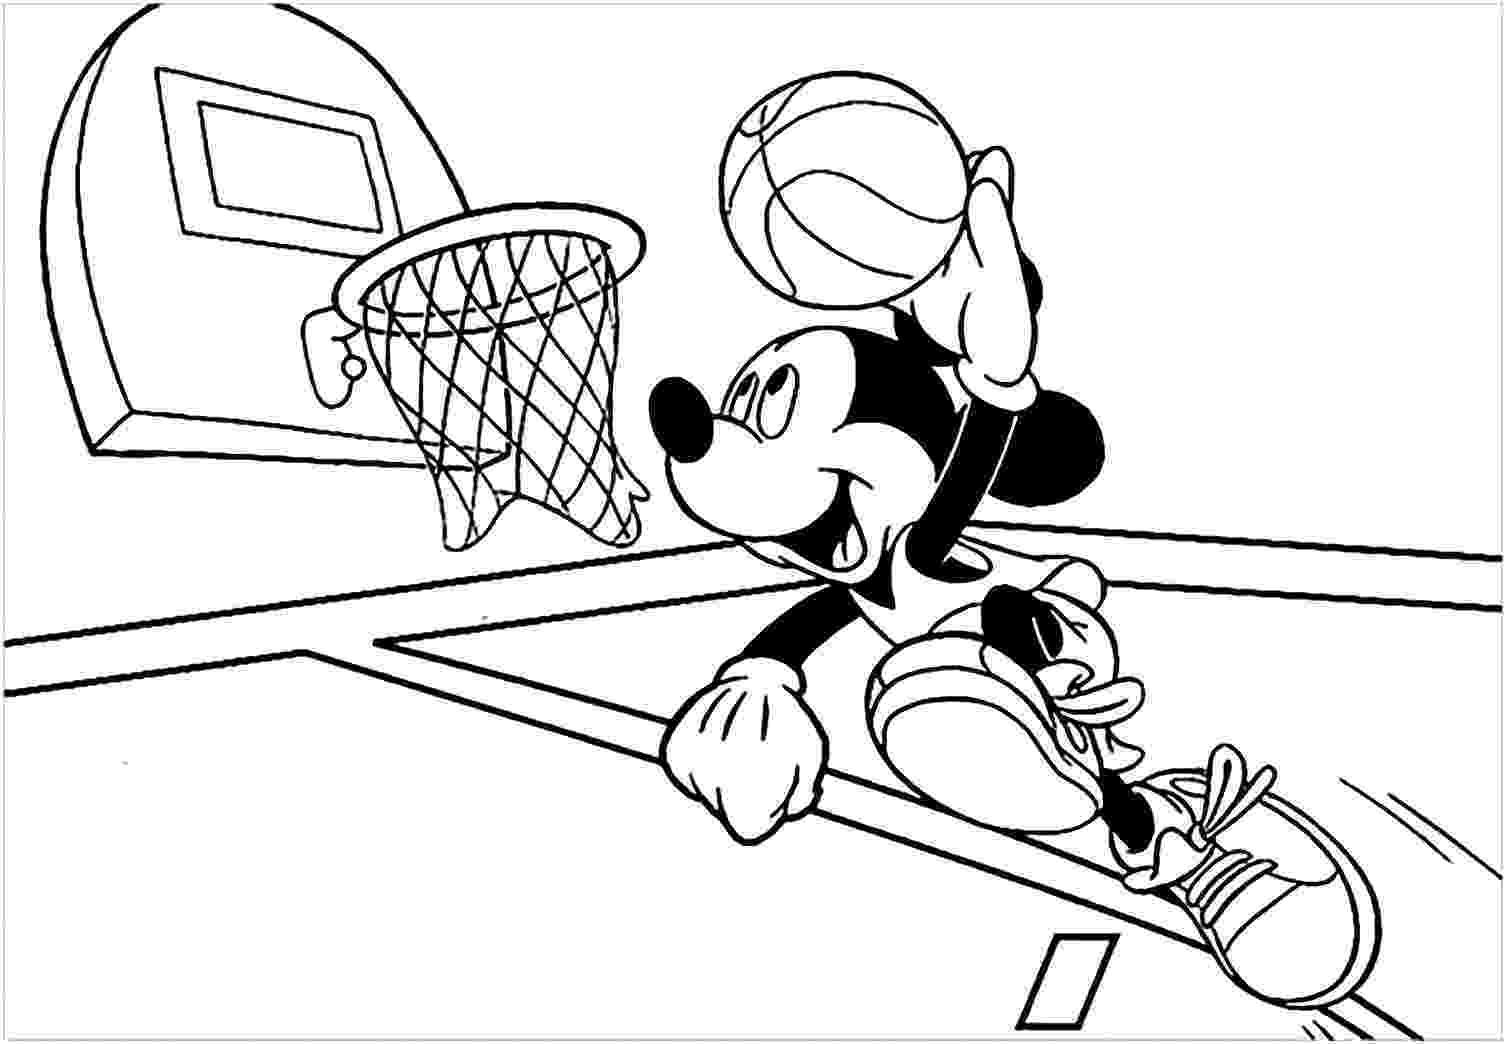 basketball pictures to color basketball coloring page coloring page christmastoysceo pictures color basketball to